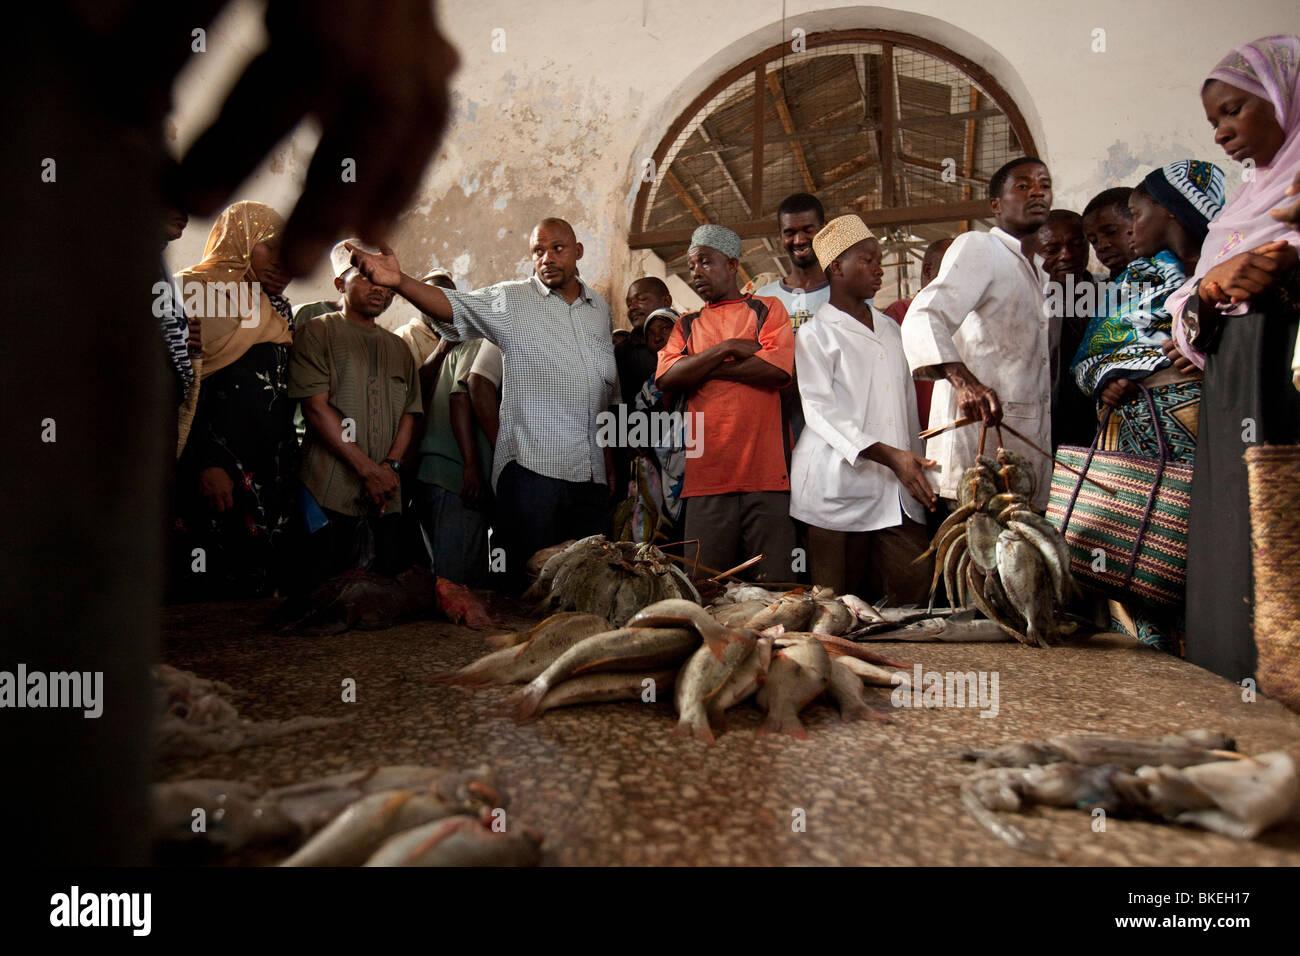 Fish auction - Stonetown, Zanzibar, Tanzania. - Stock Image